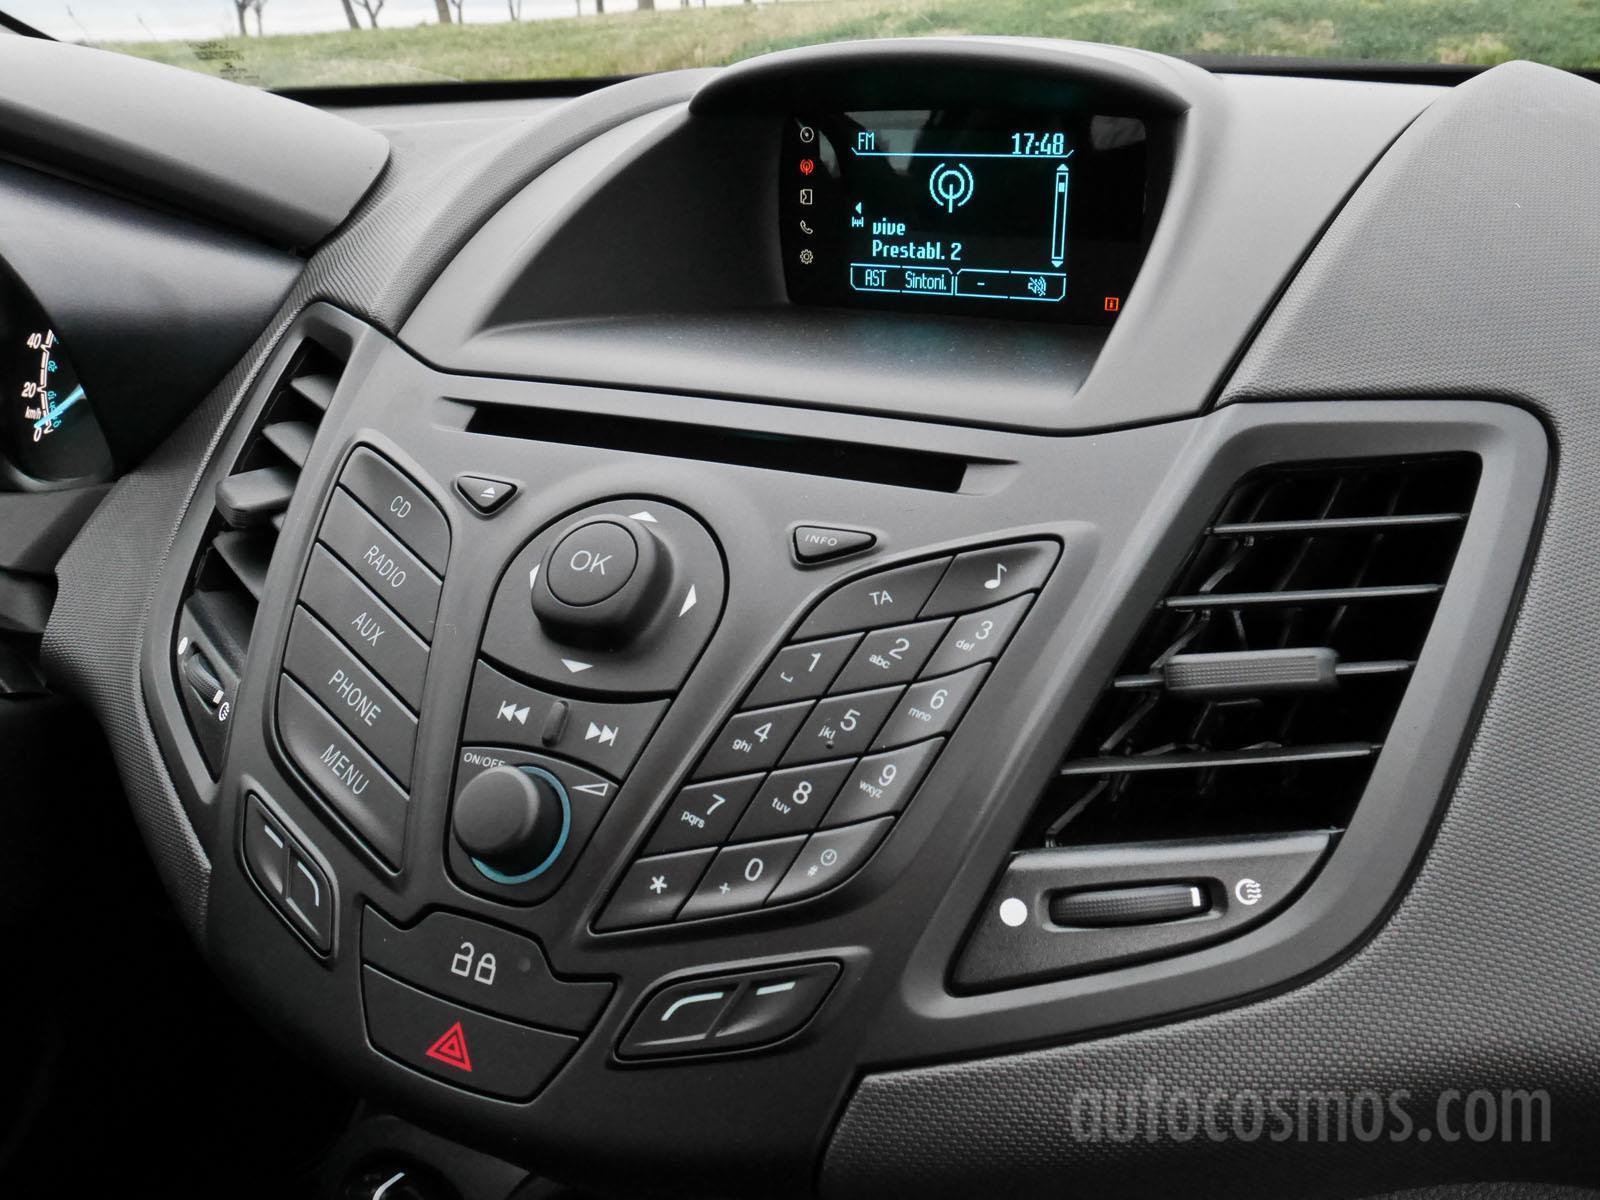 2014 Ford Fiesta Se Interior >> Prueba Ford Fiesta Kinetic hecho en Brasil - Autocosmos.com